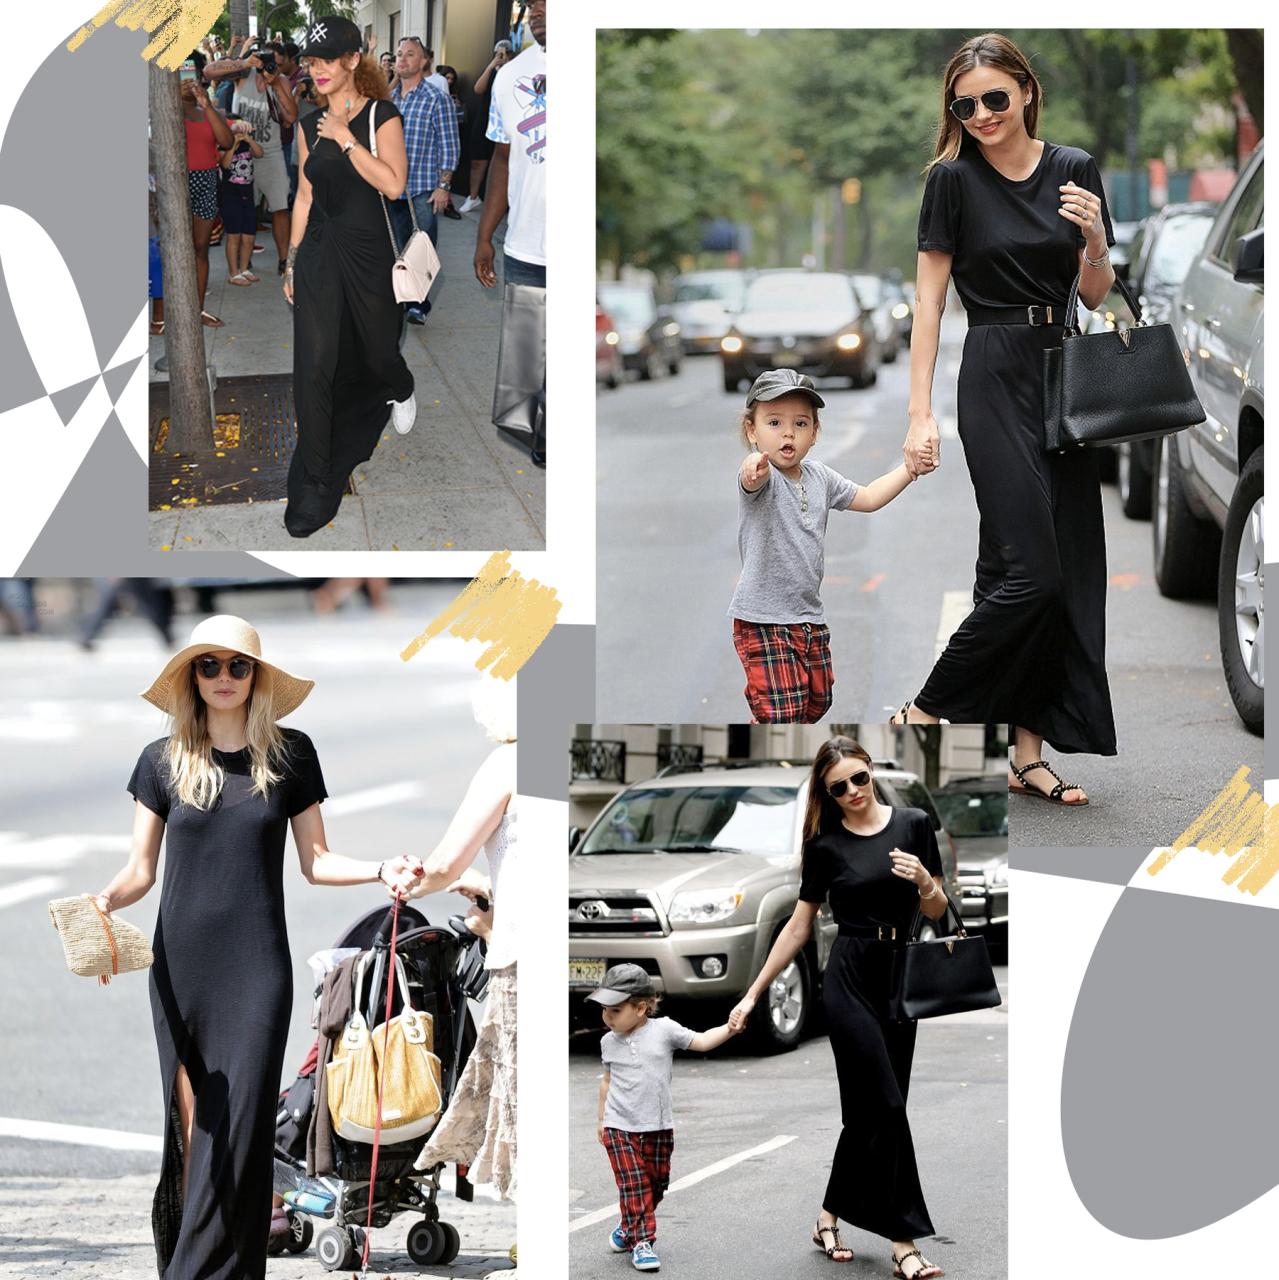 style-file-black-masix-dress-street-style-the-great-beyond-vegan-eco-fashion